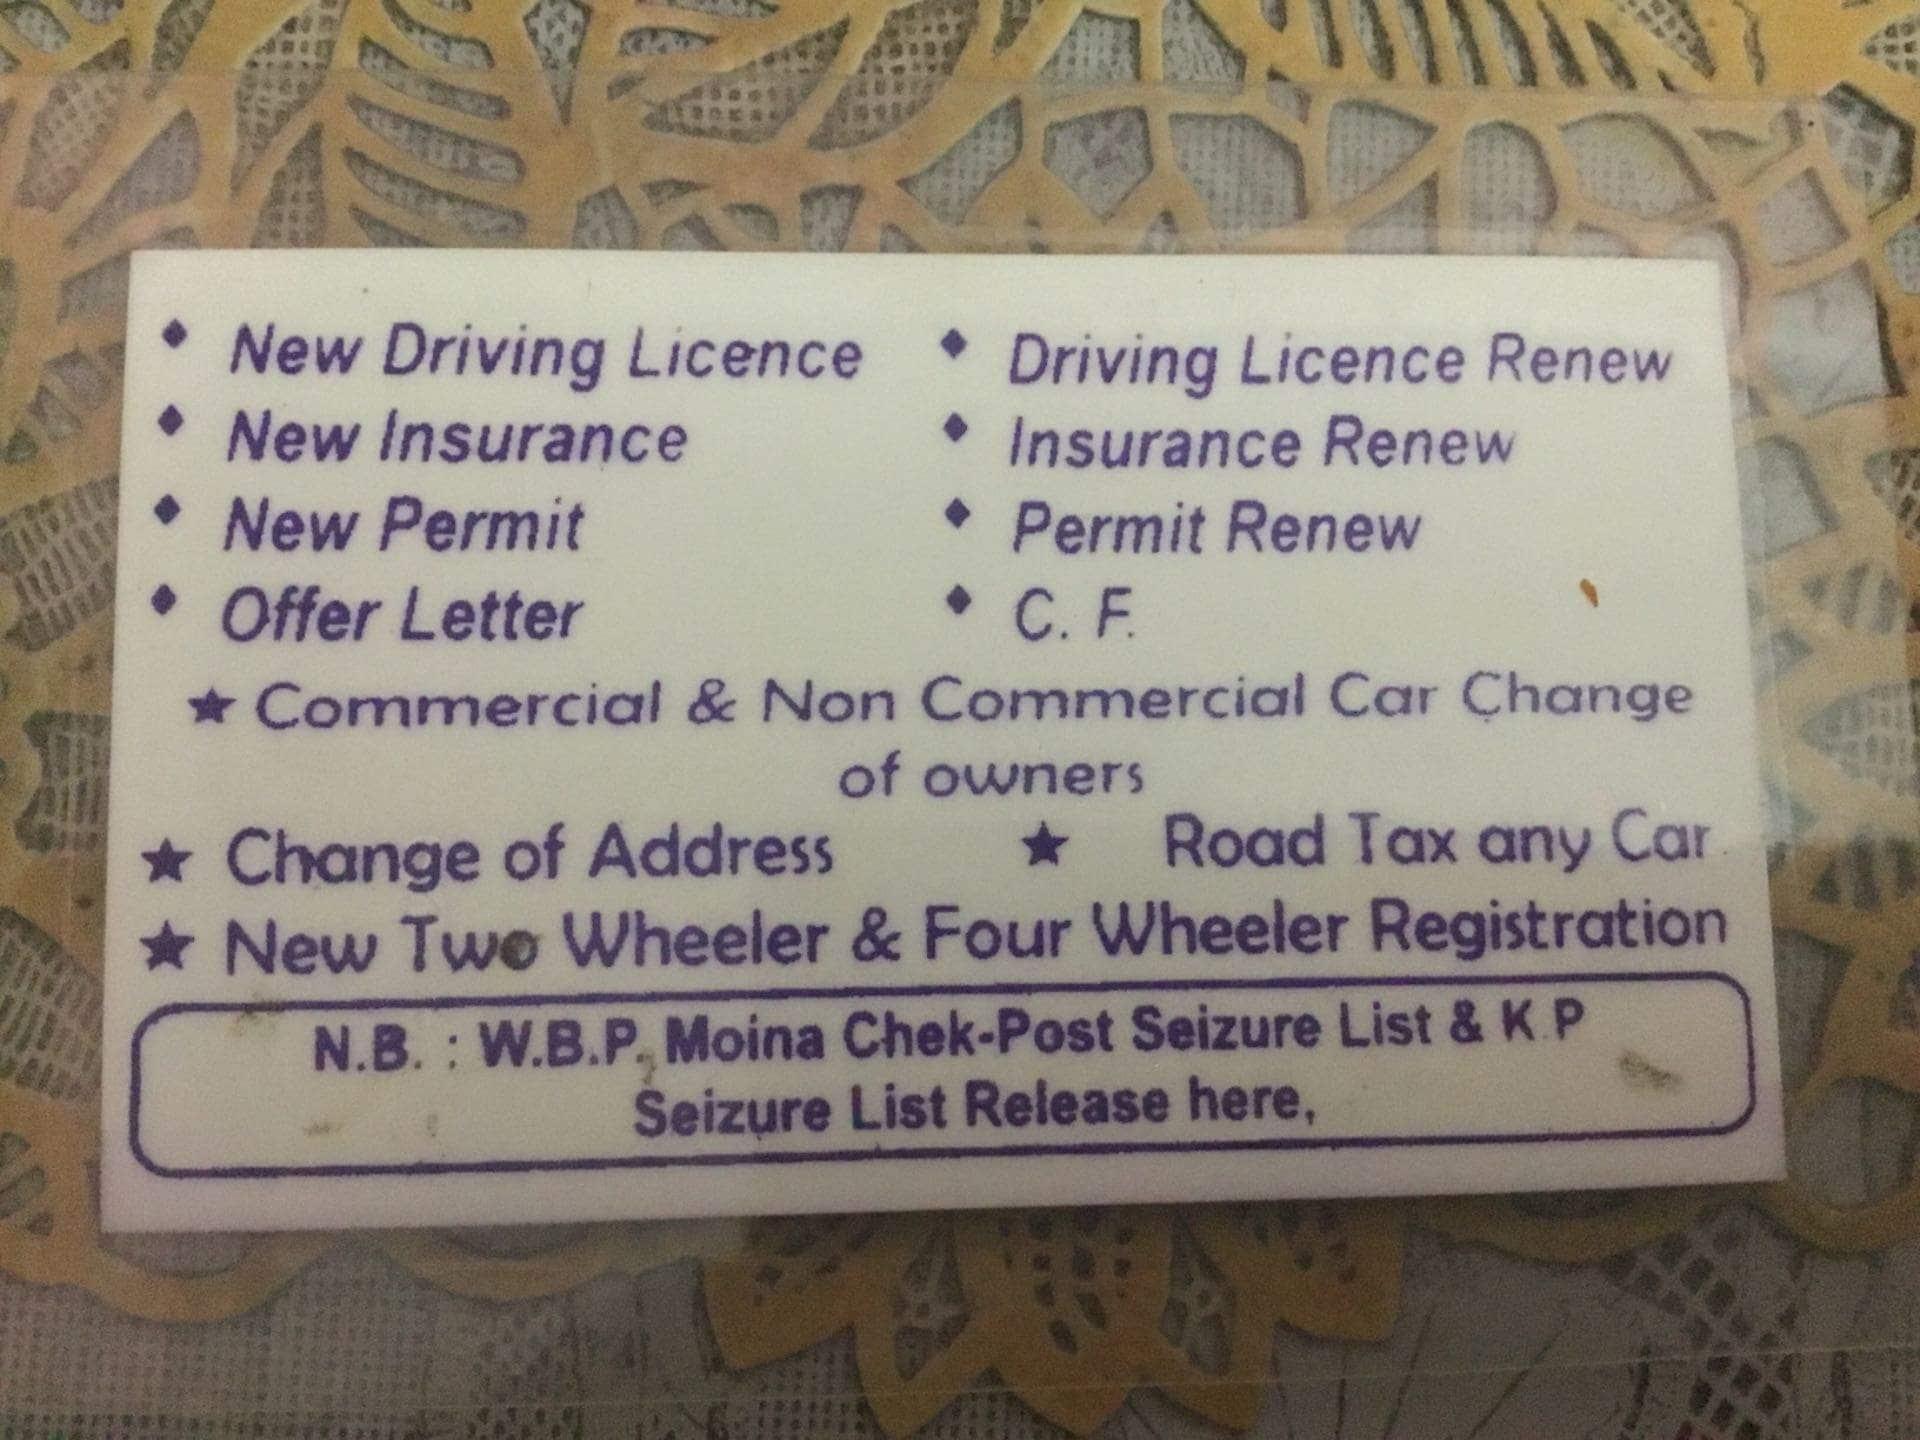 Top Driving License Consultants in Behala - Best Driving